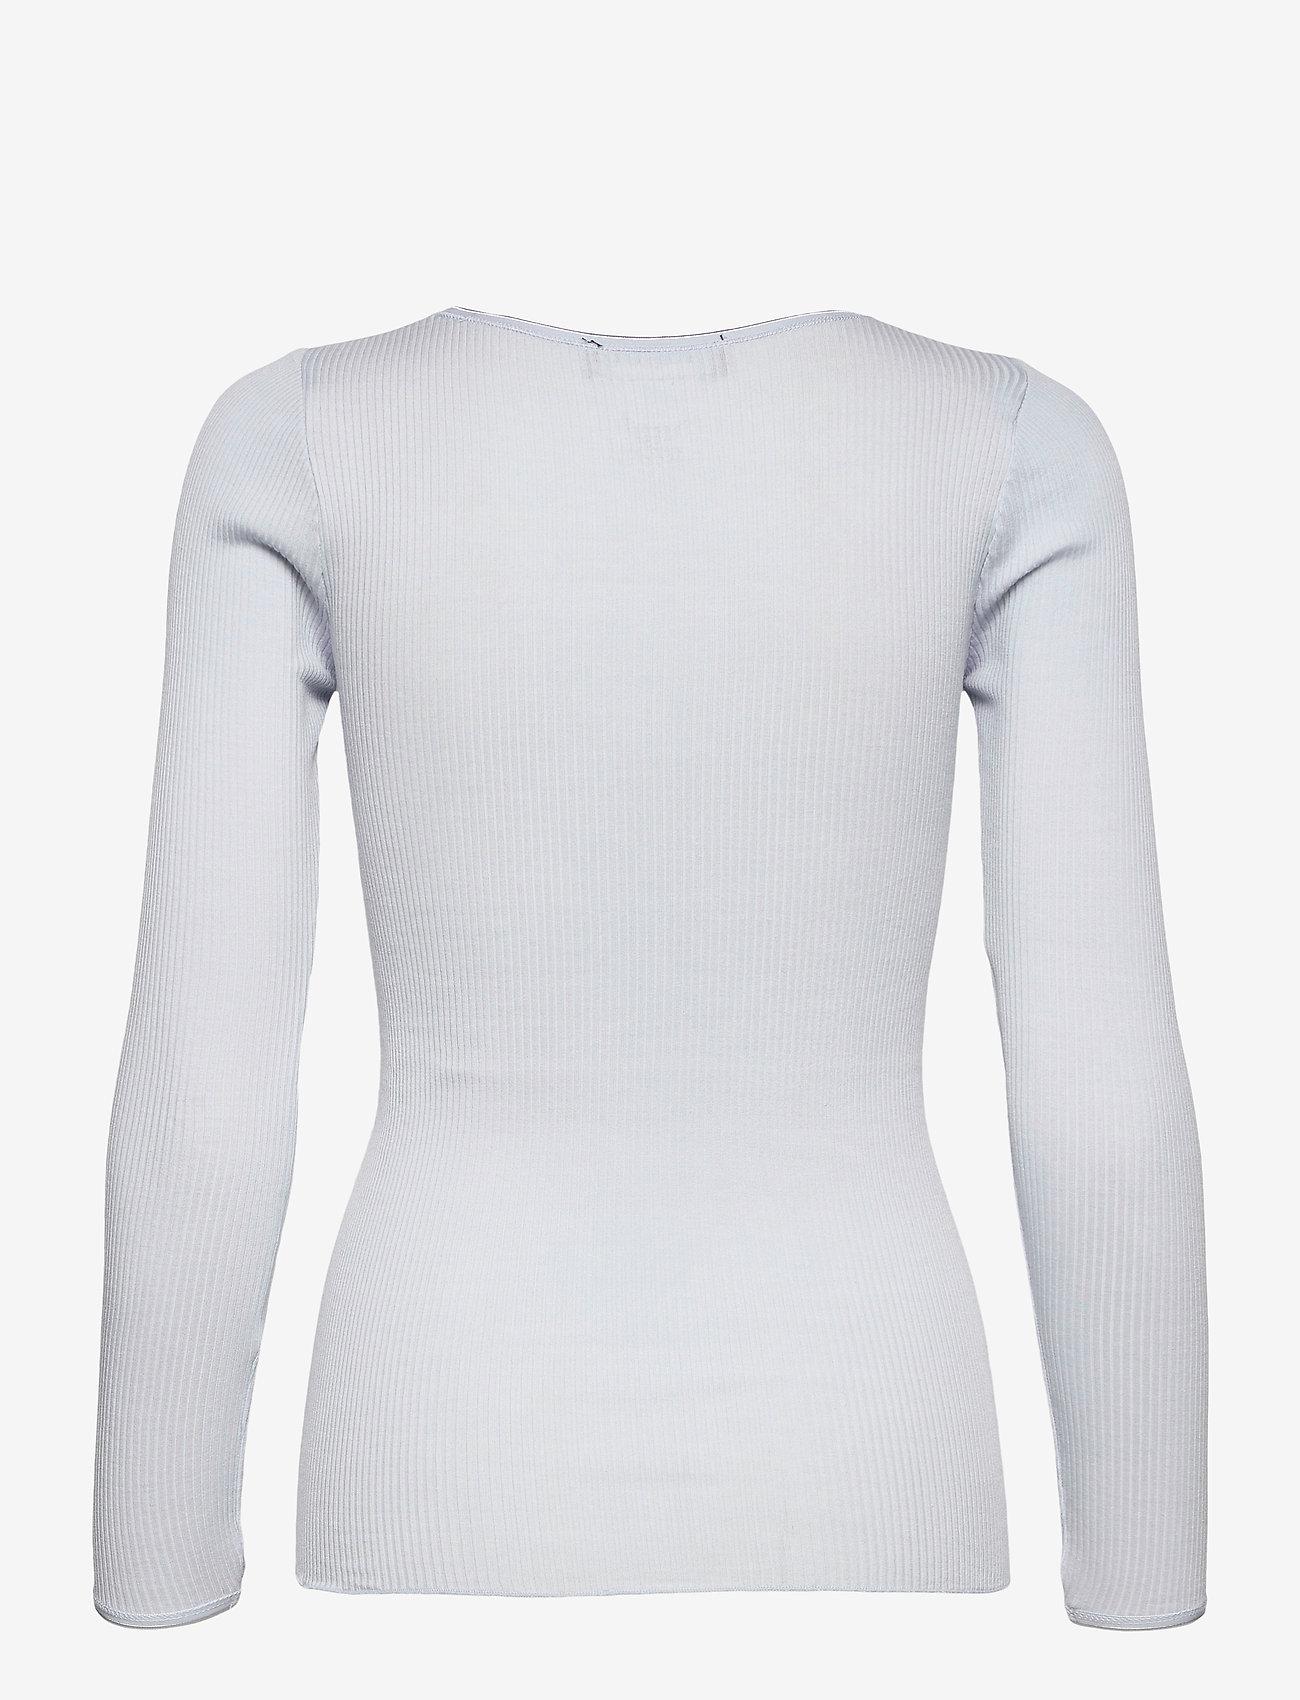 Rosemunde - Silk t-shirt w/ elastic band - långärmade toppar - heather sky - 1